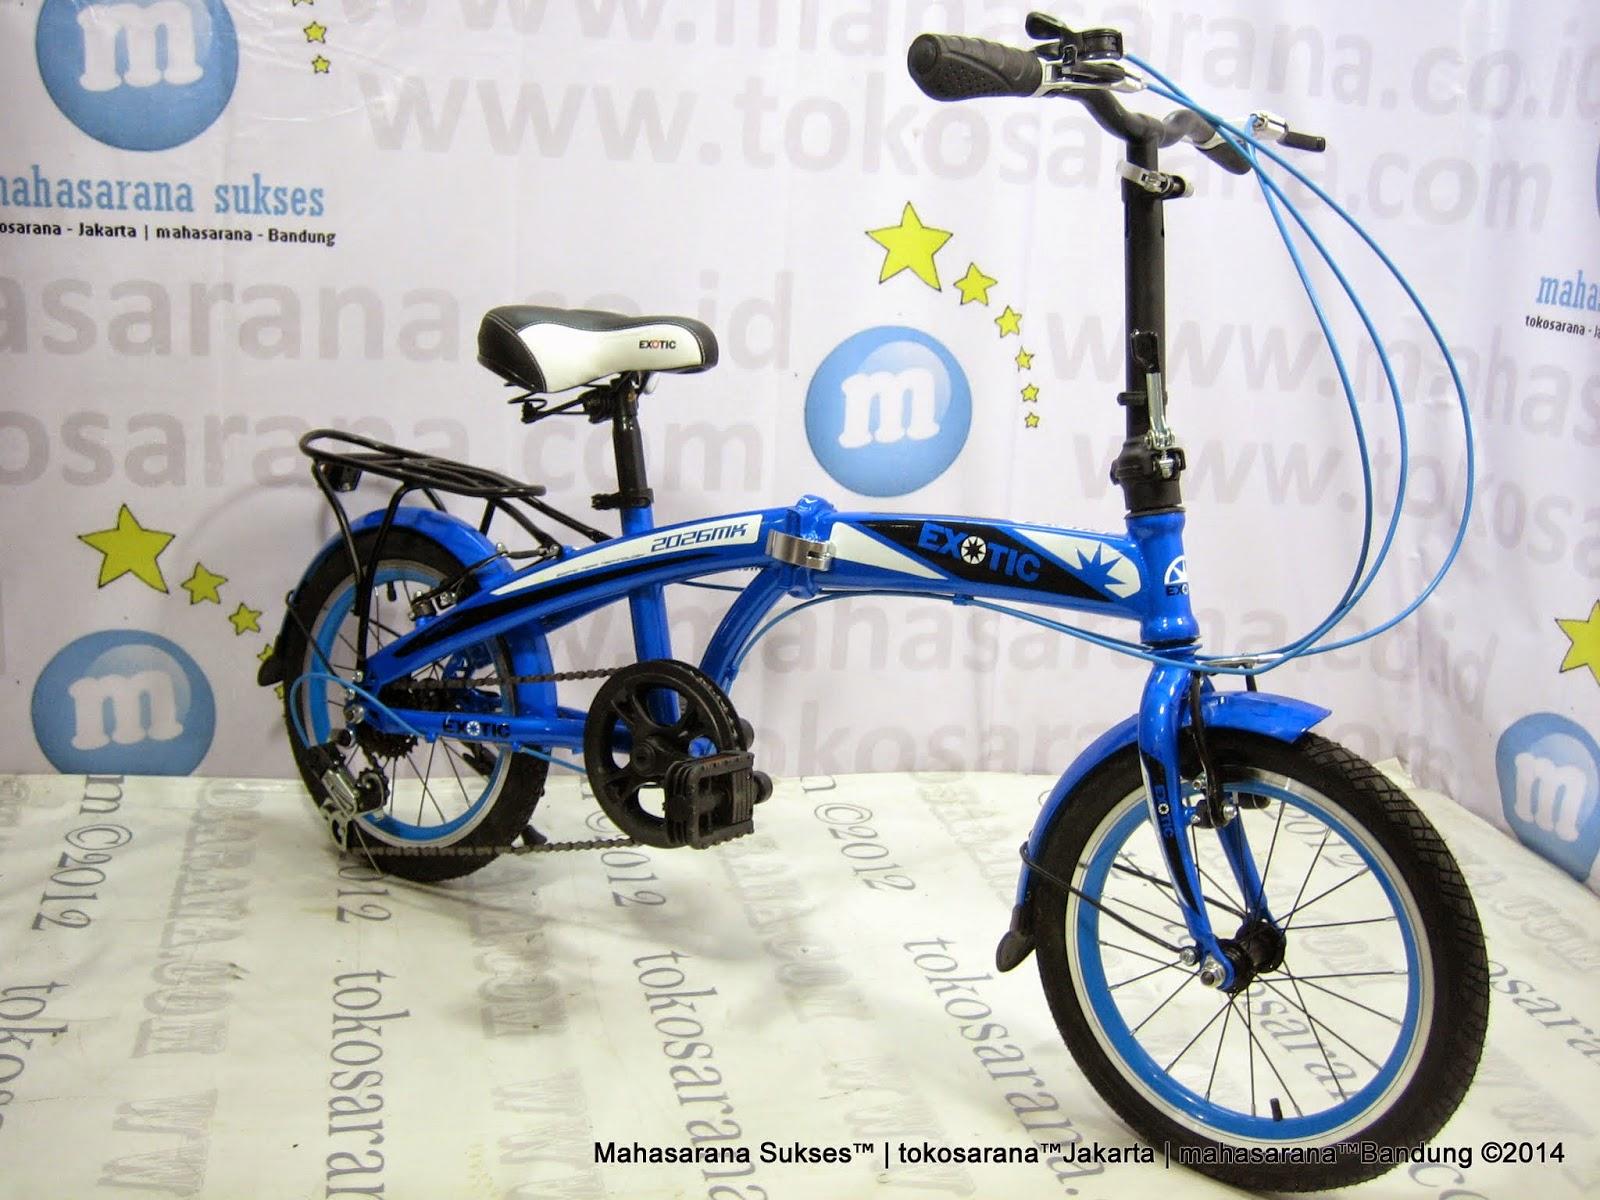 tokosarana™ | Mahasarana Sukses™: Sepeda Lipat Exotic